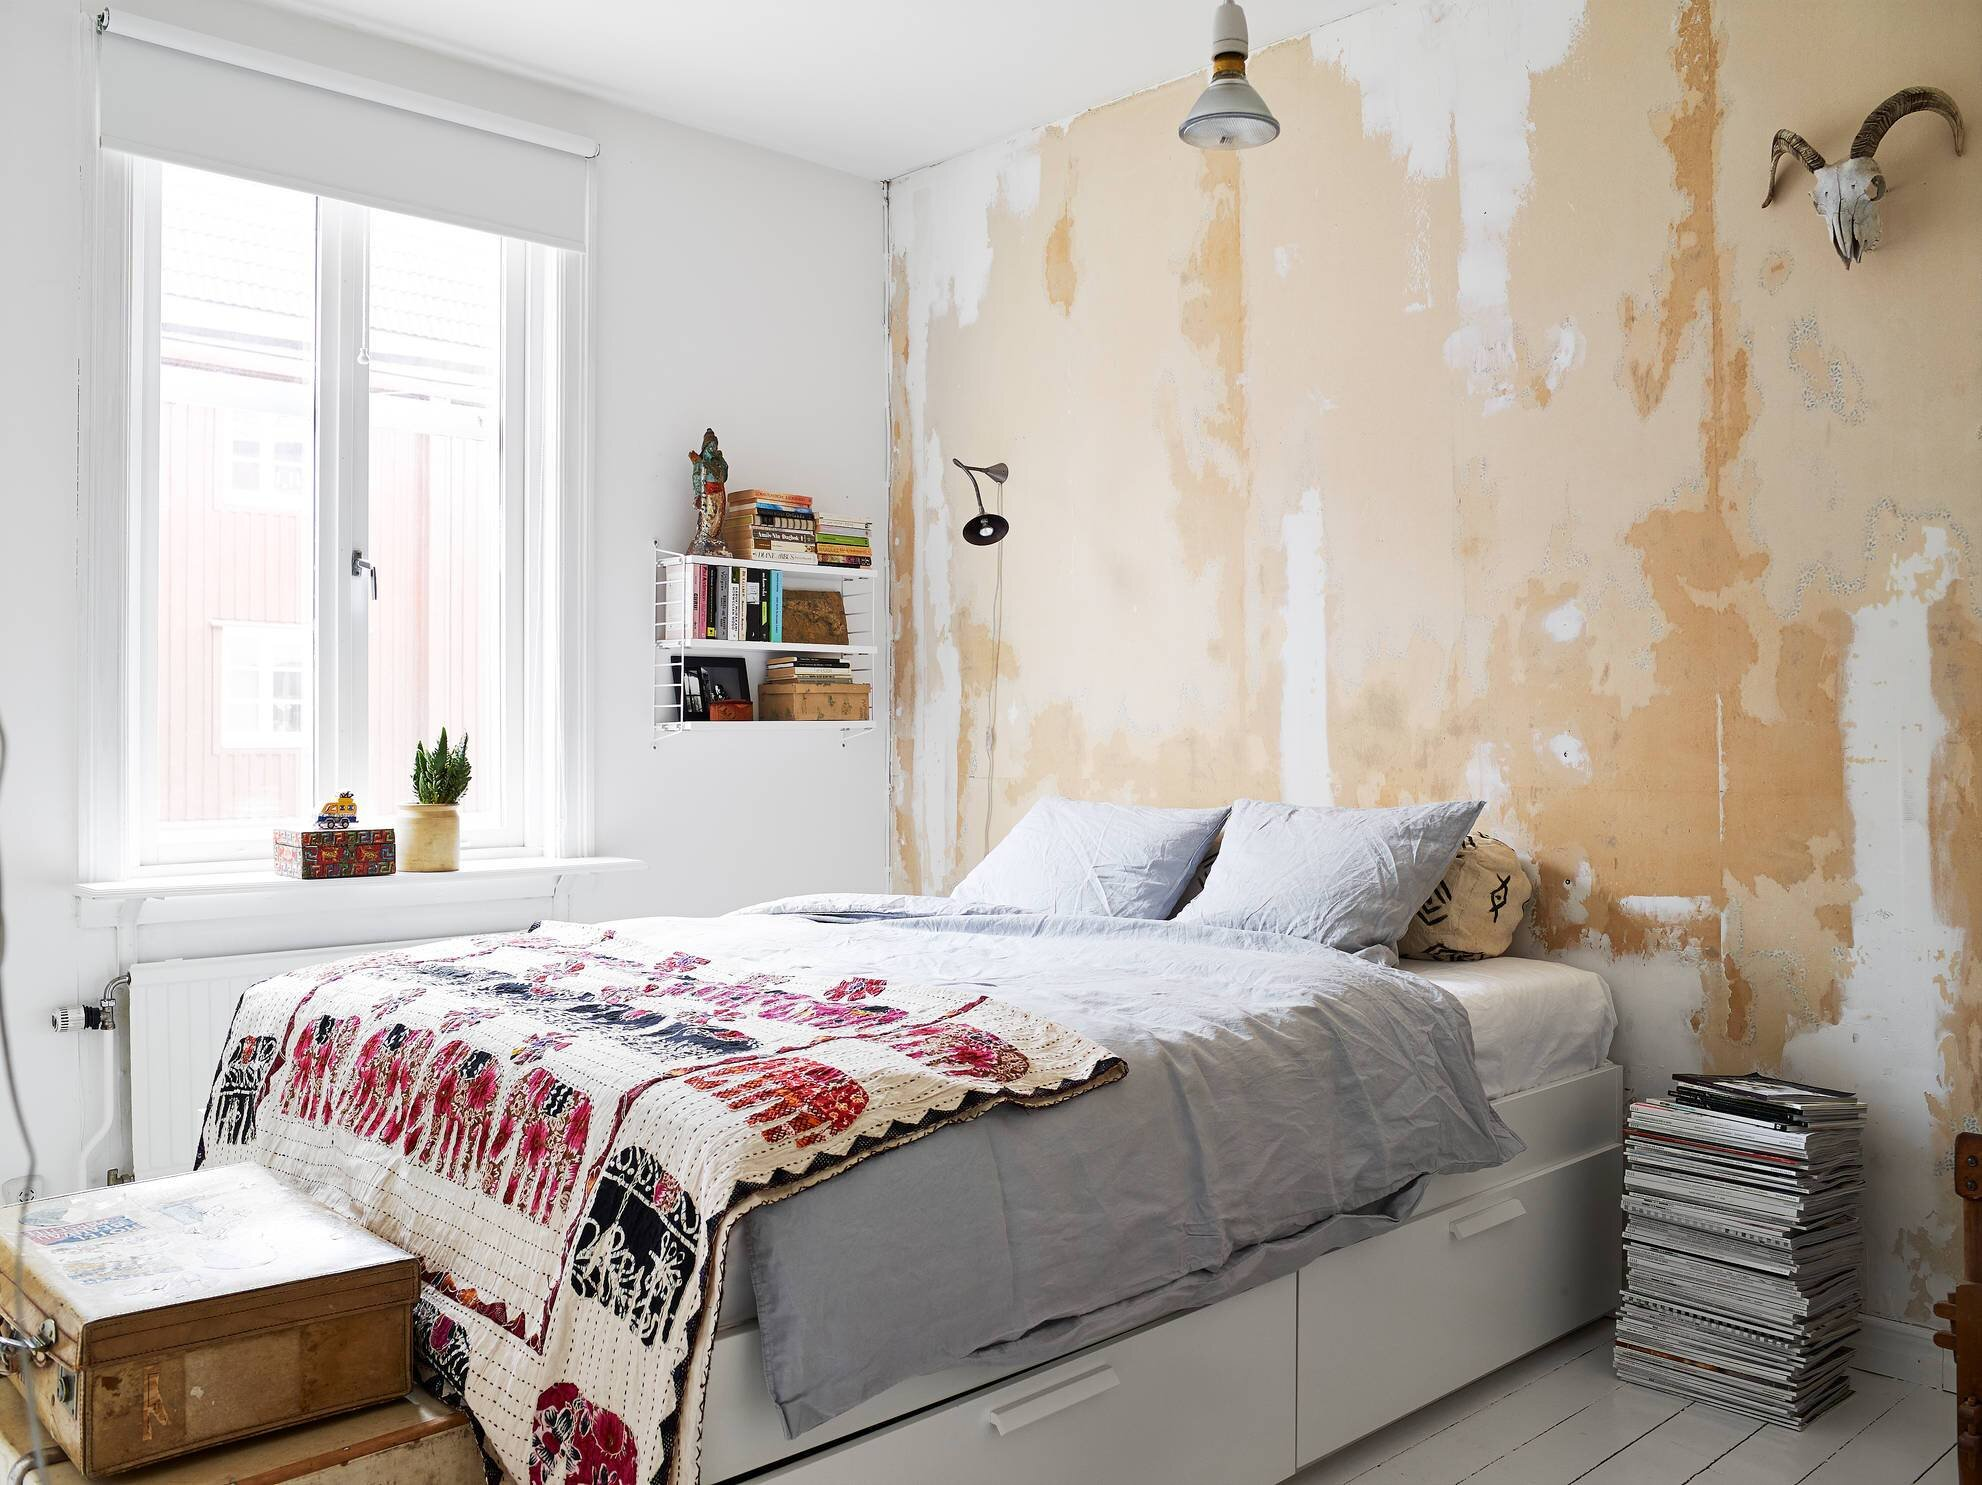 Small Apartment - Goteburg - Sweden - Stadhem - Bedroom - Humble Homes